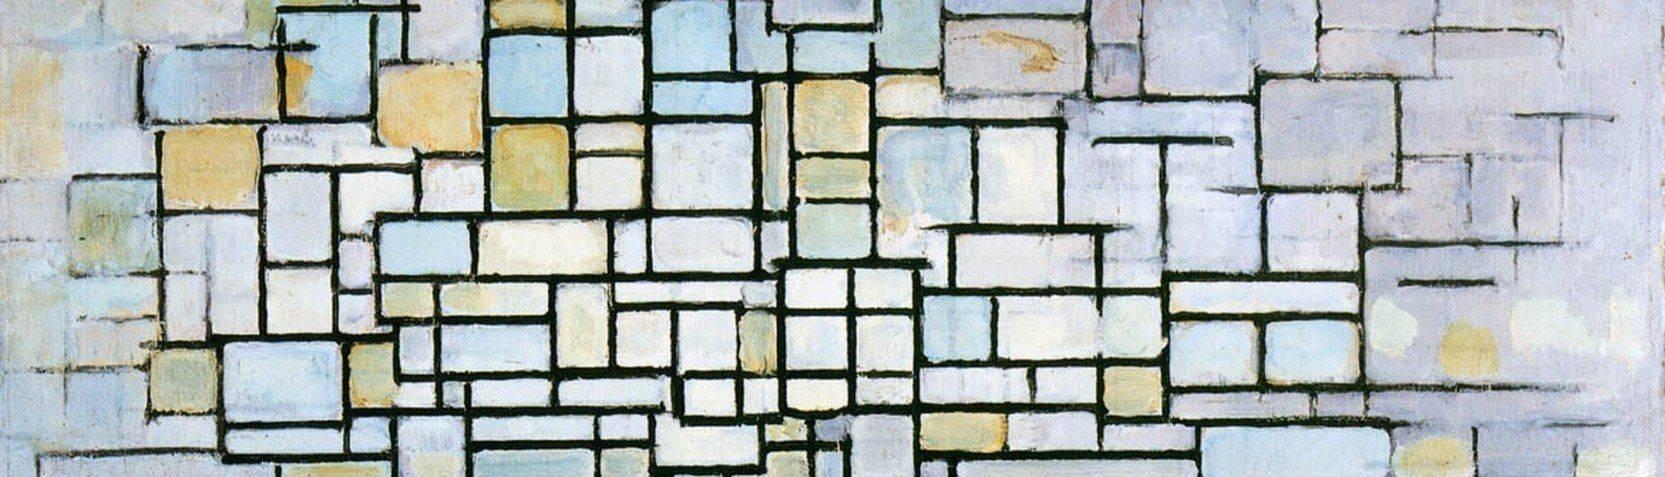 Artisti - Piet Mondrian